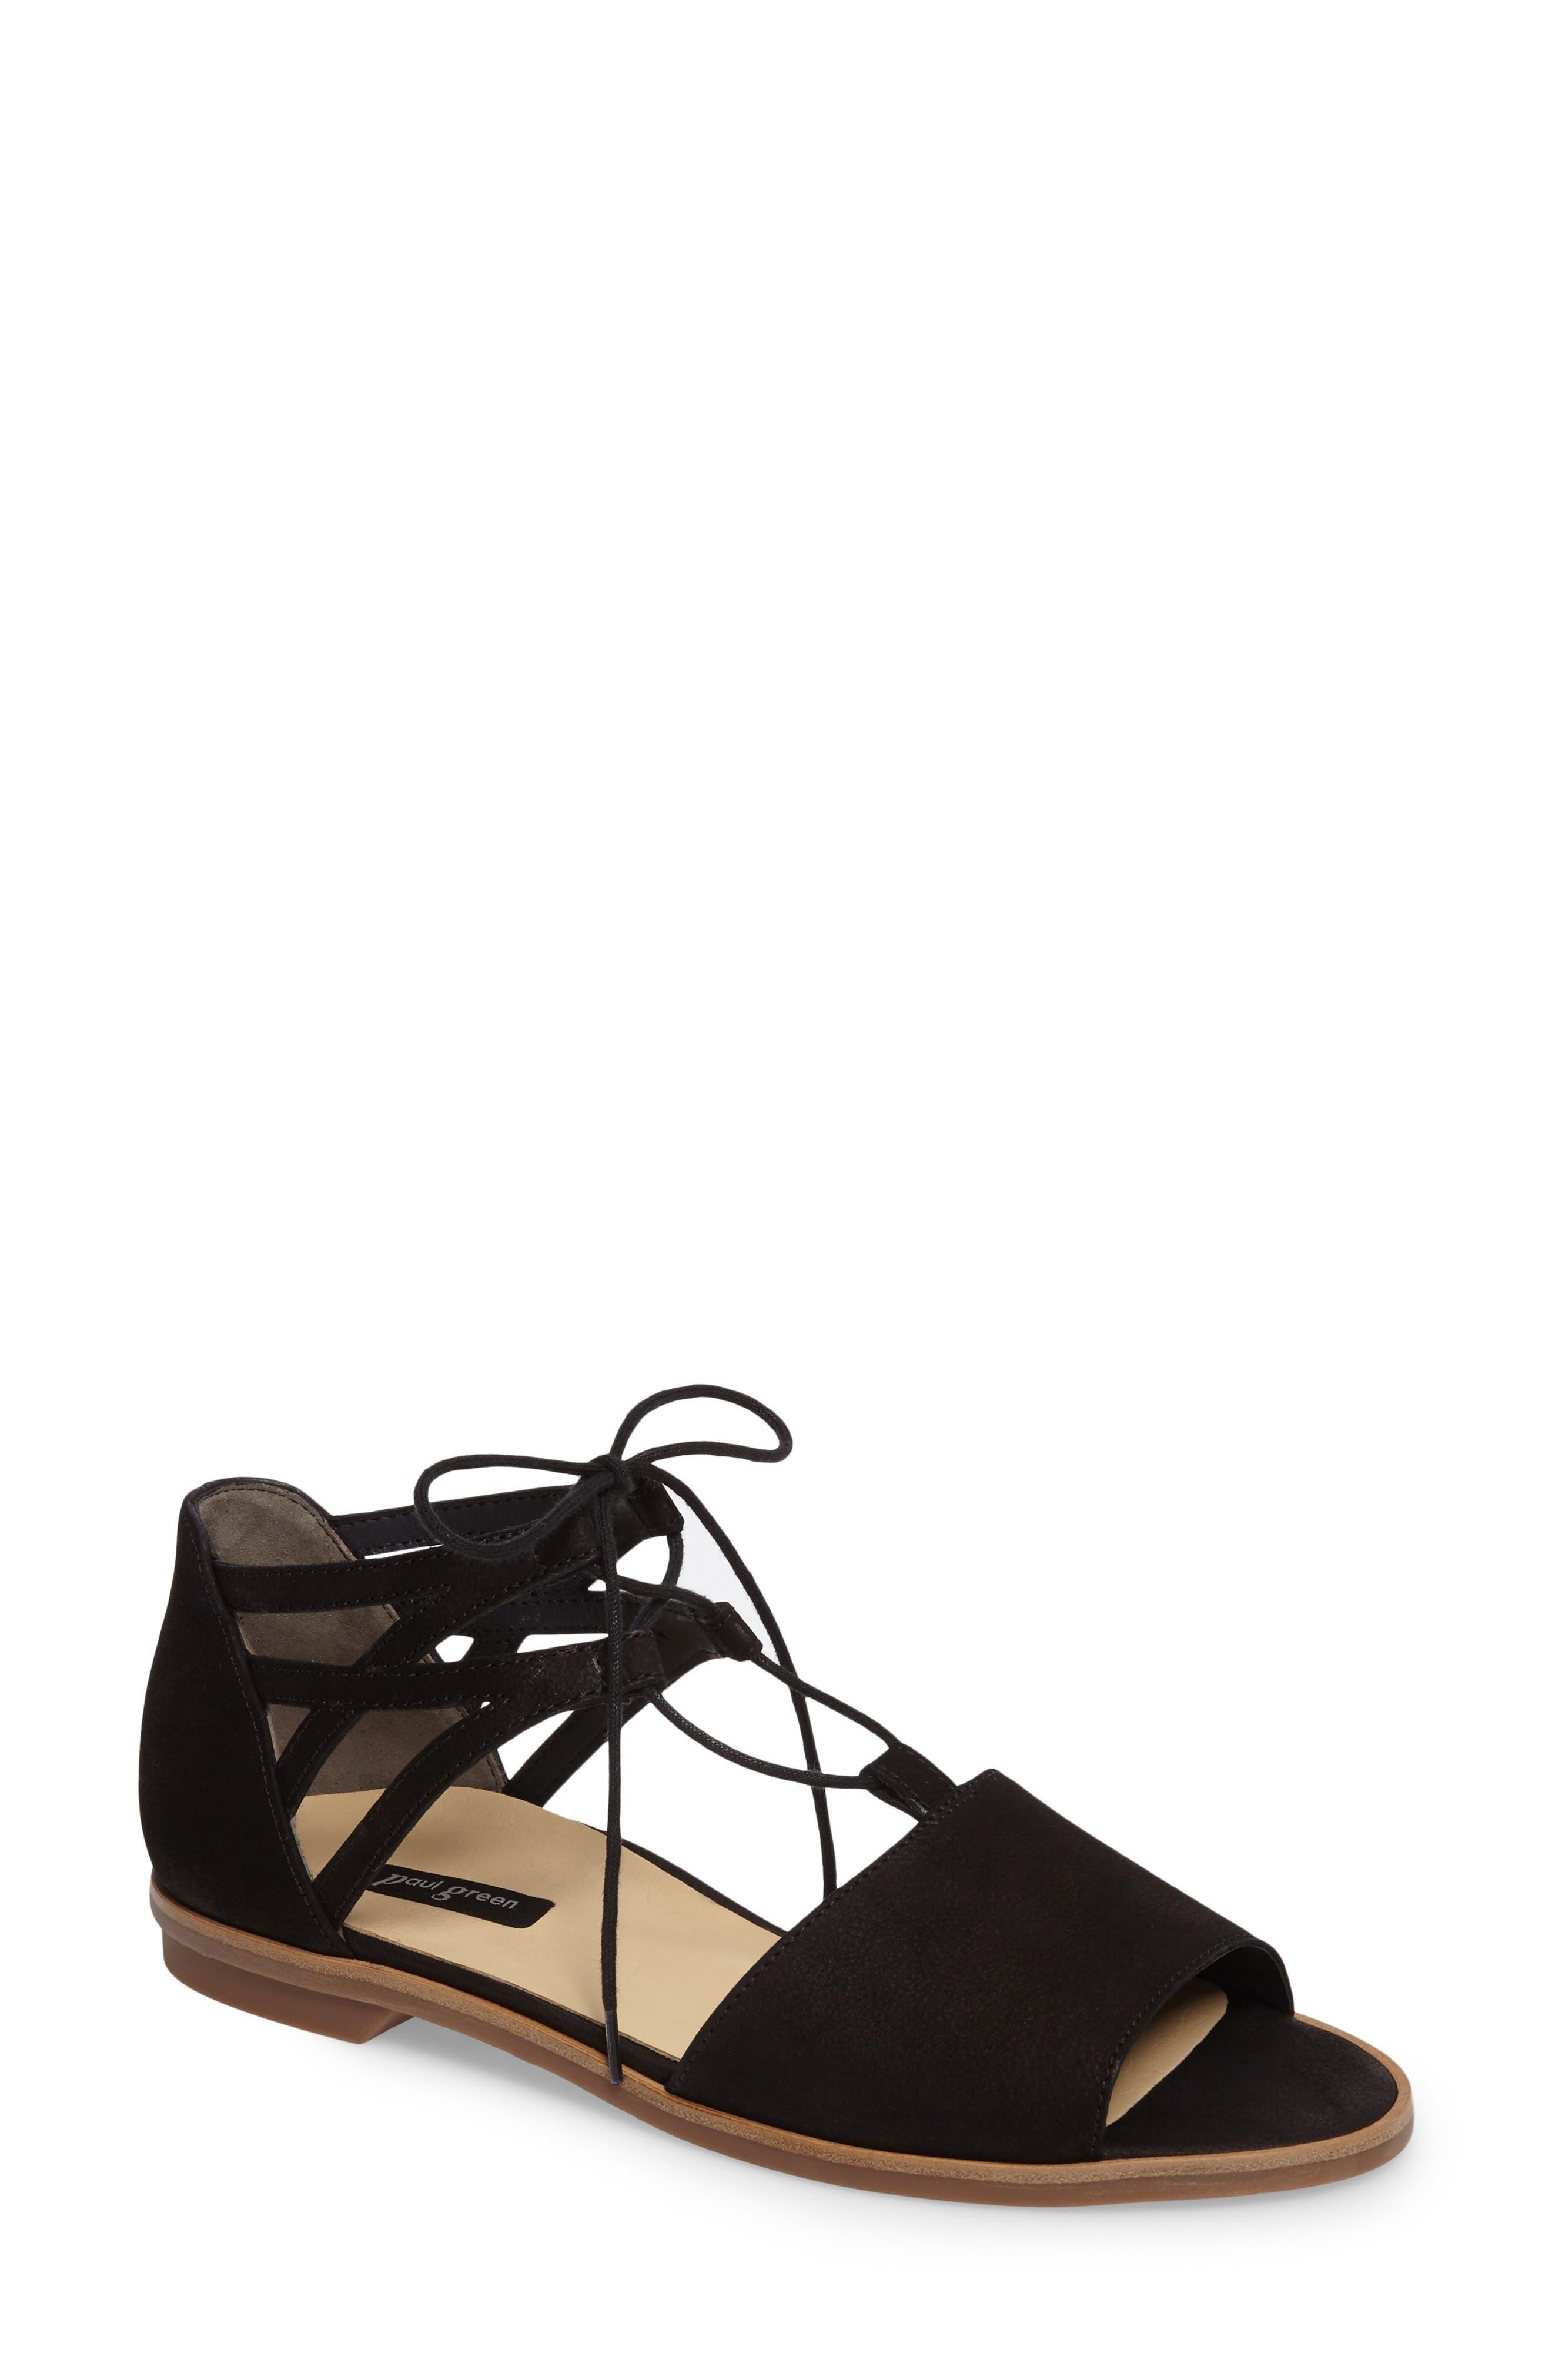 PAUL GREEN Morea Lace-Up Sandal, Main, color, BLACK LEATHER